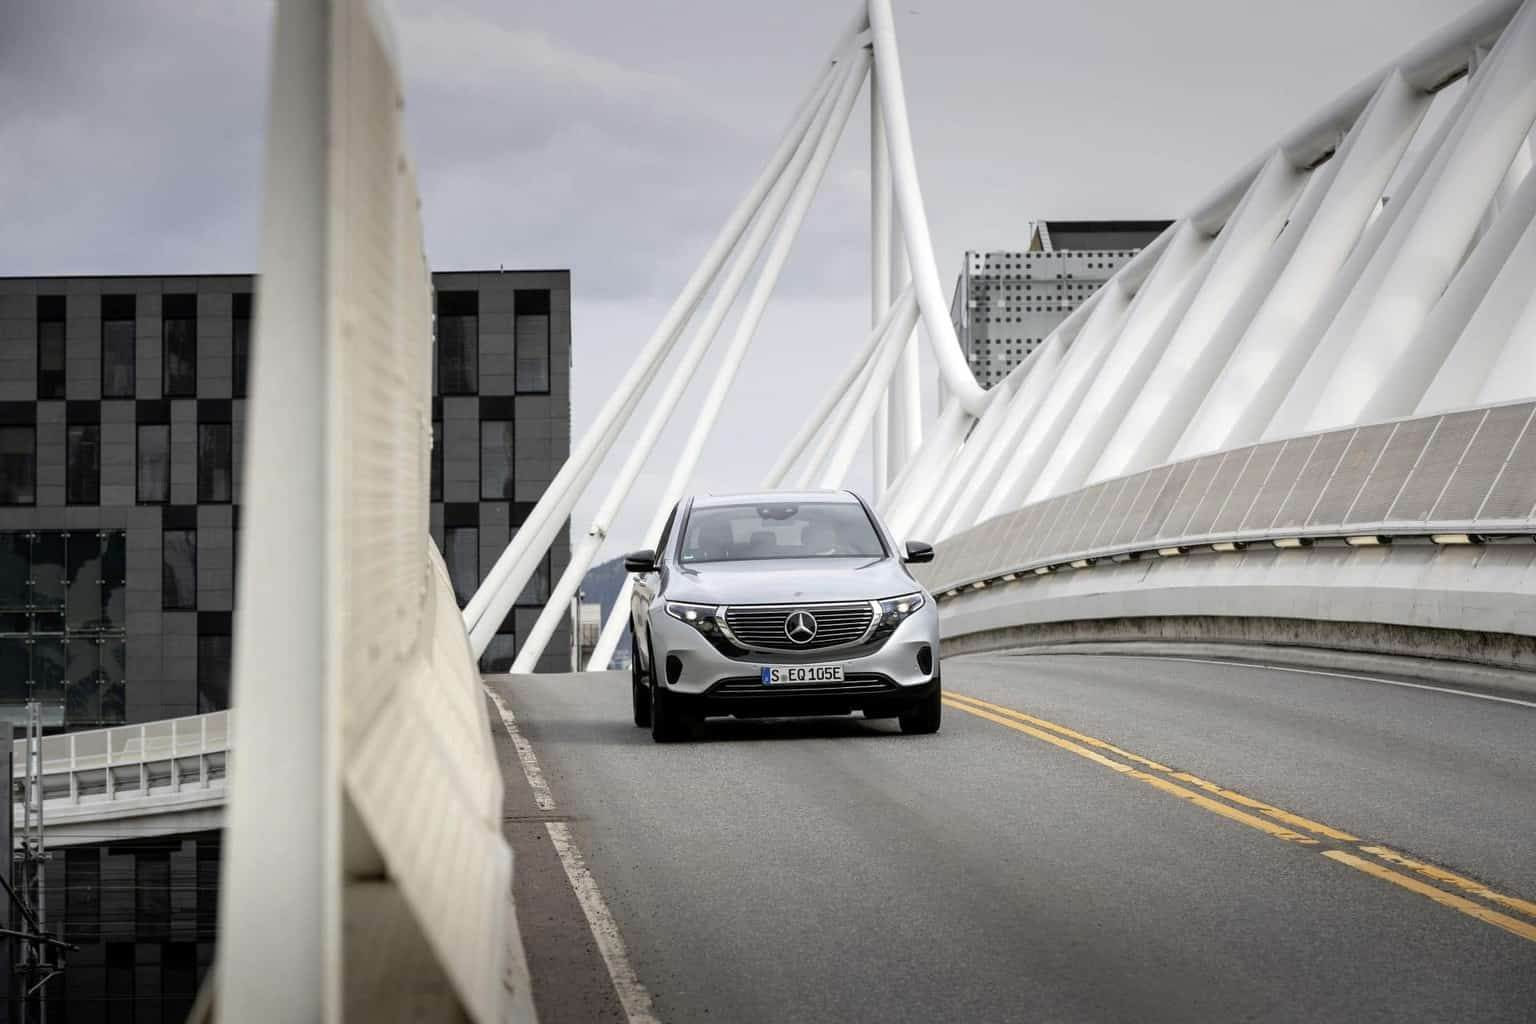 Mercedes dementiert Halbierung der EQC-Produktionsziele wegen Batteriemangels